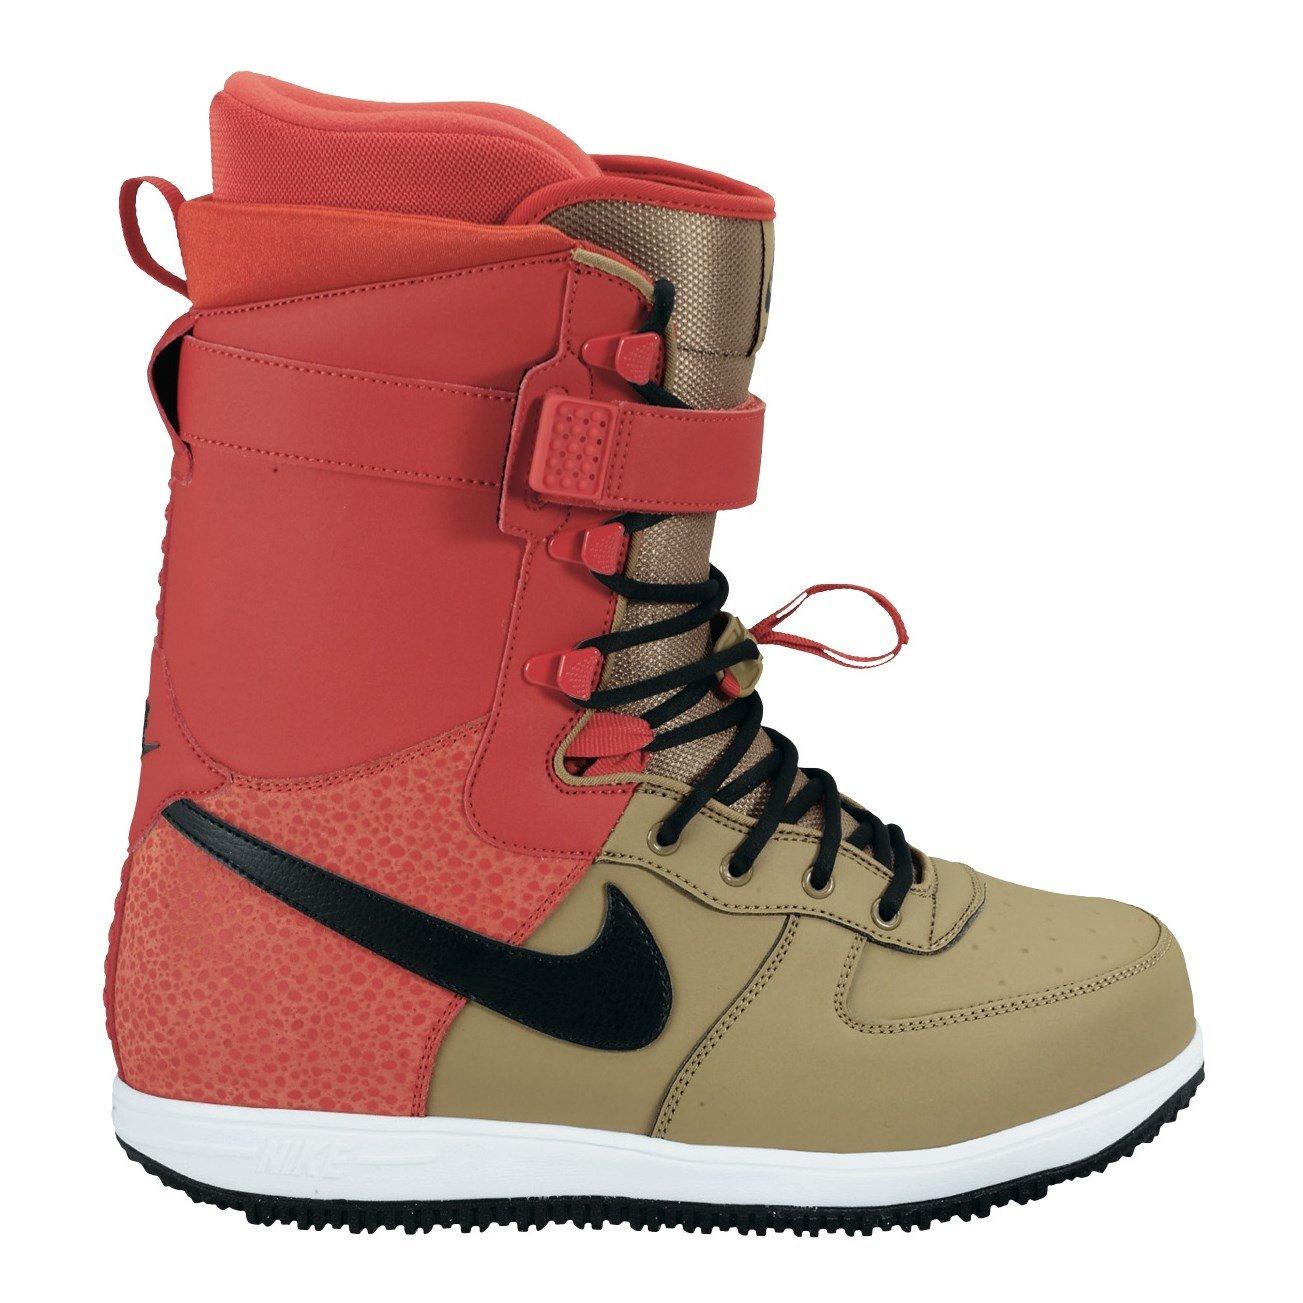 881c47178b2 Nike Zoom Force 1 Snowboard Boots 2013